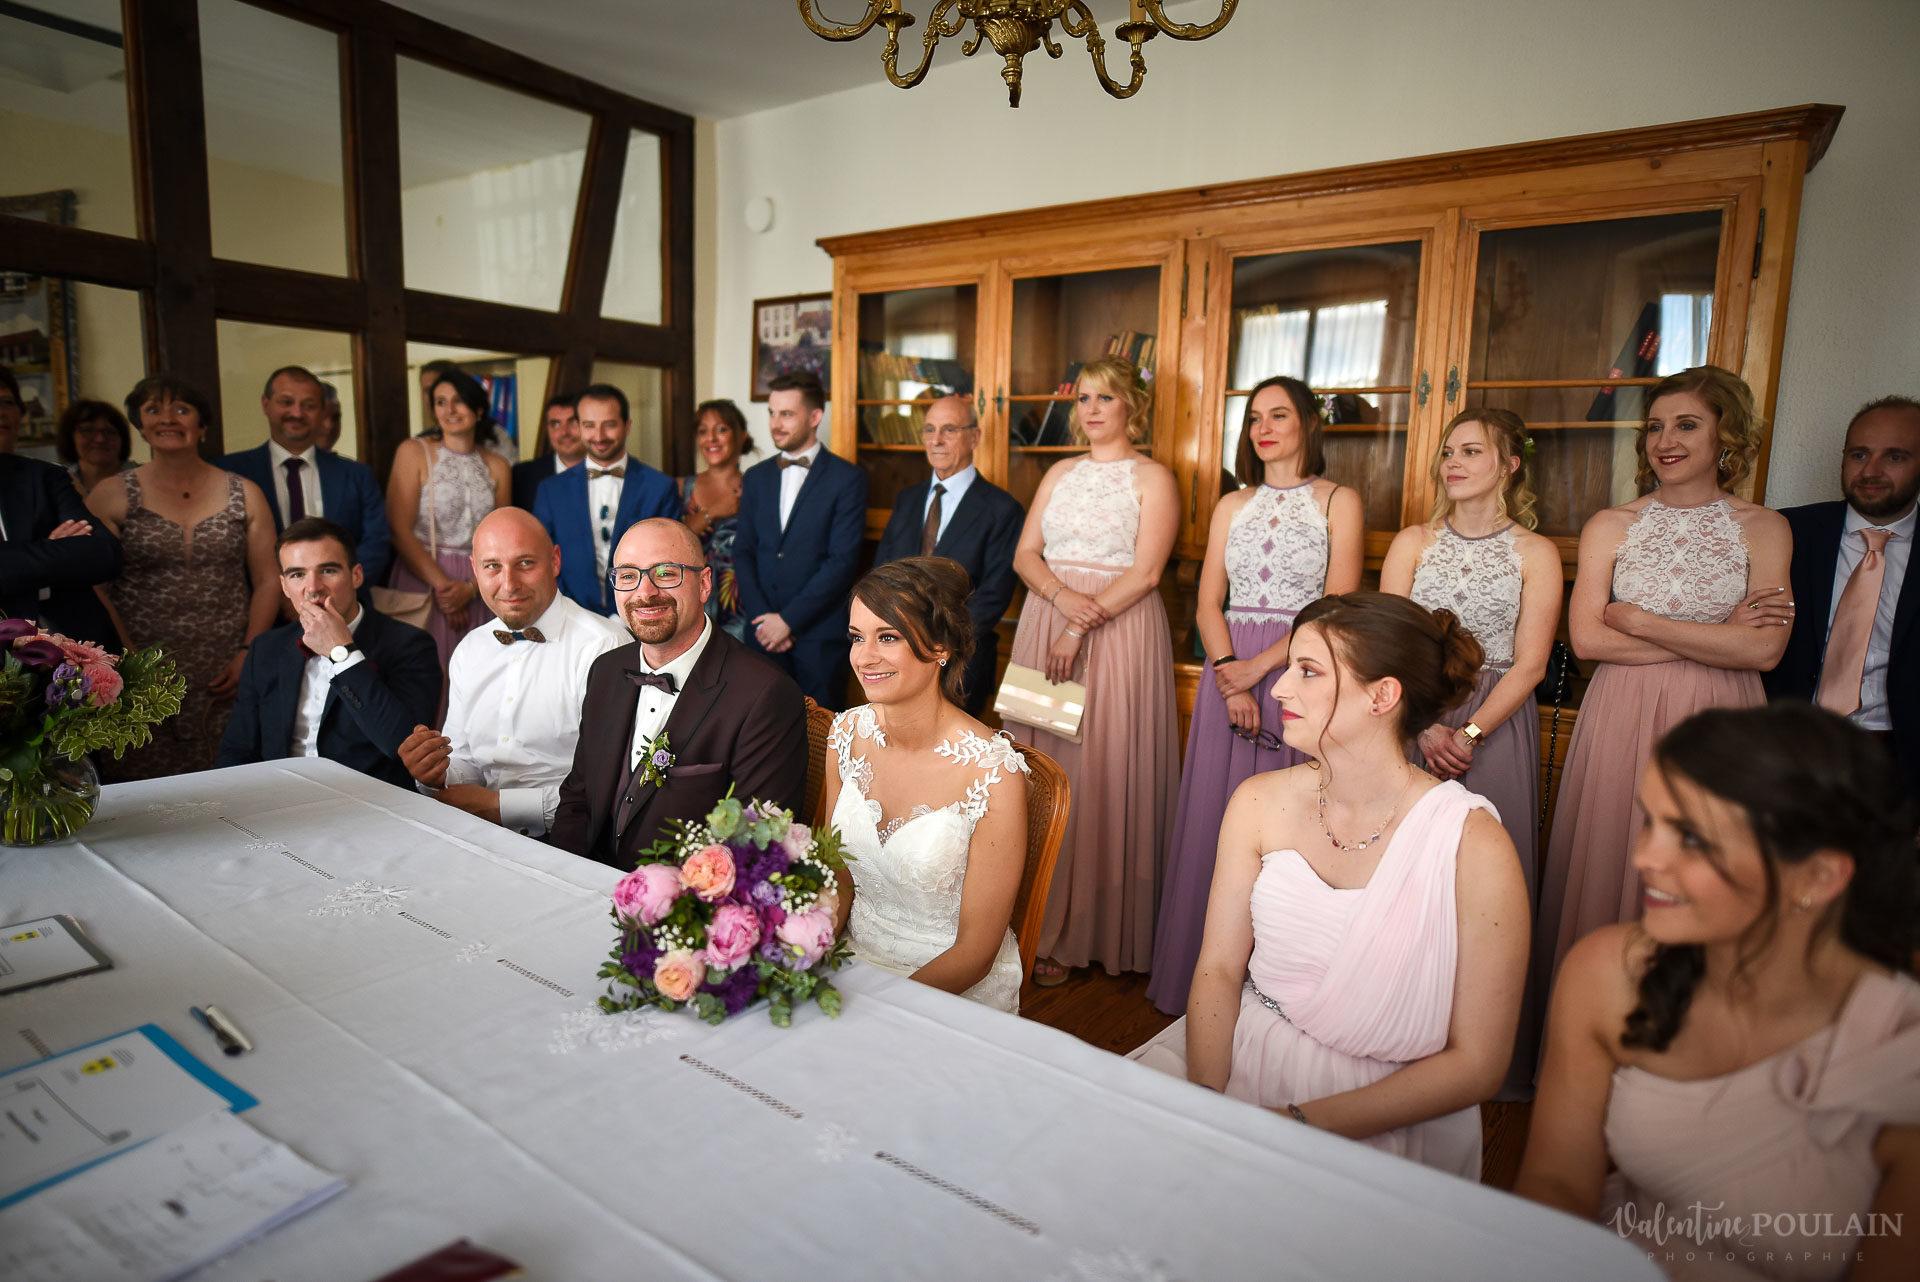 Mariage convivial Saverne - Valentine Poulain mairie